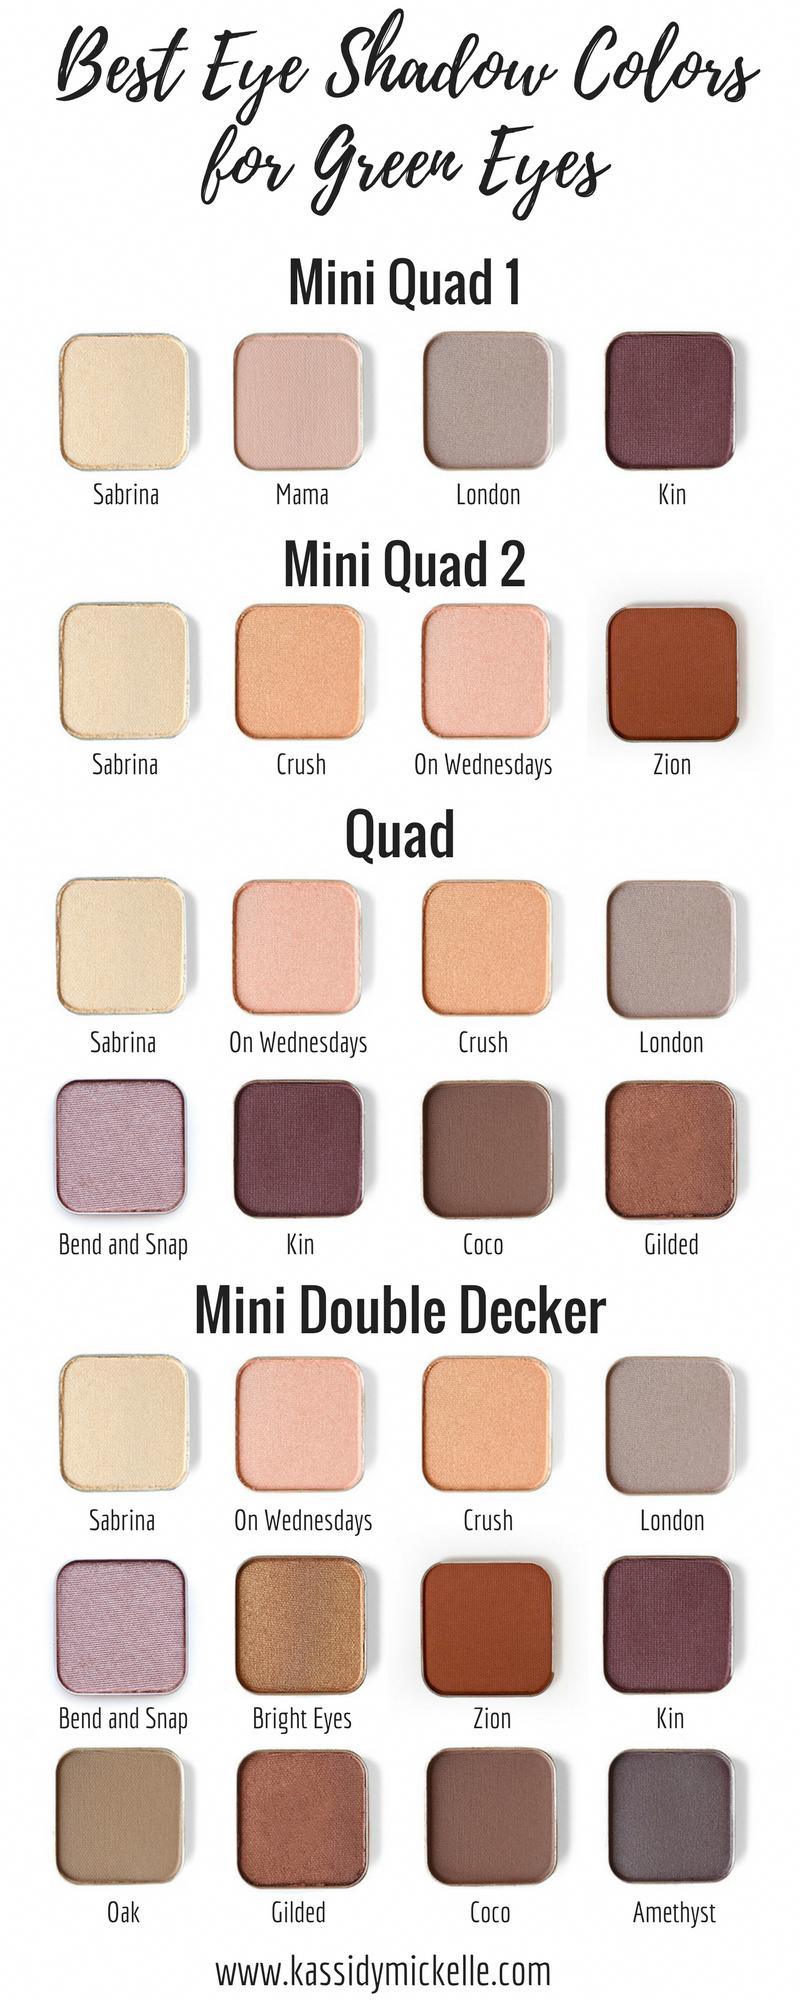 best eyeshadow colors for green eyes #besteyemakeup | best